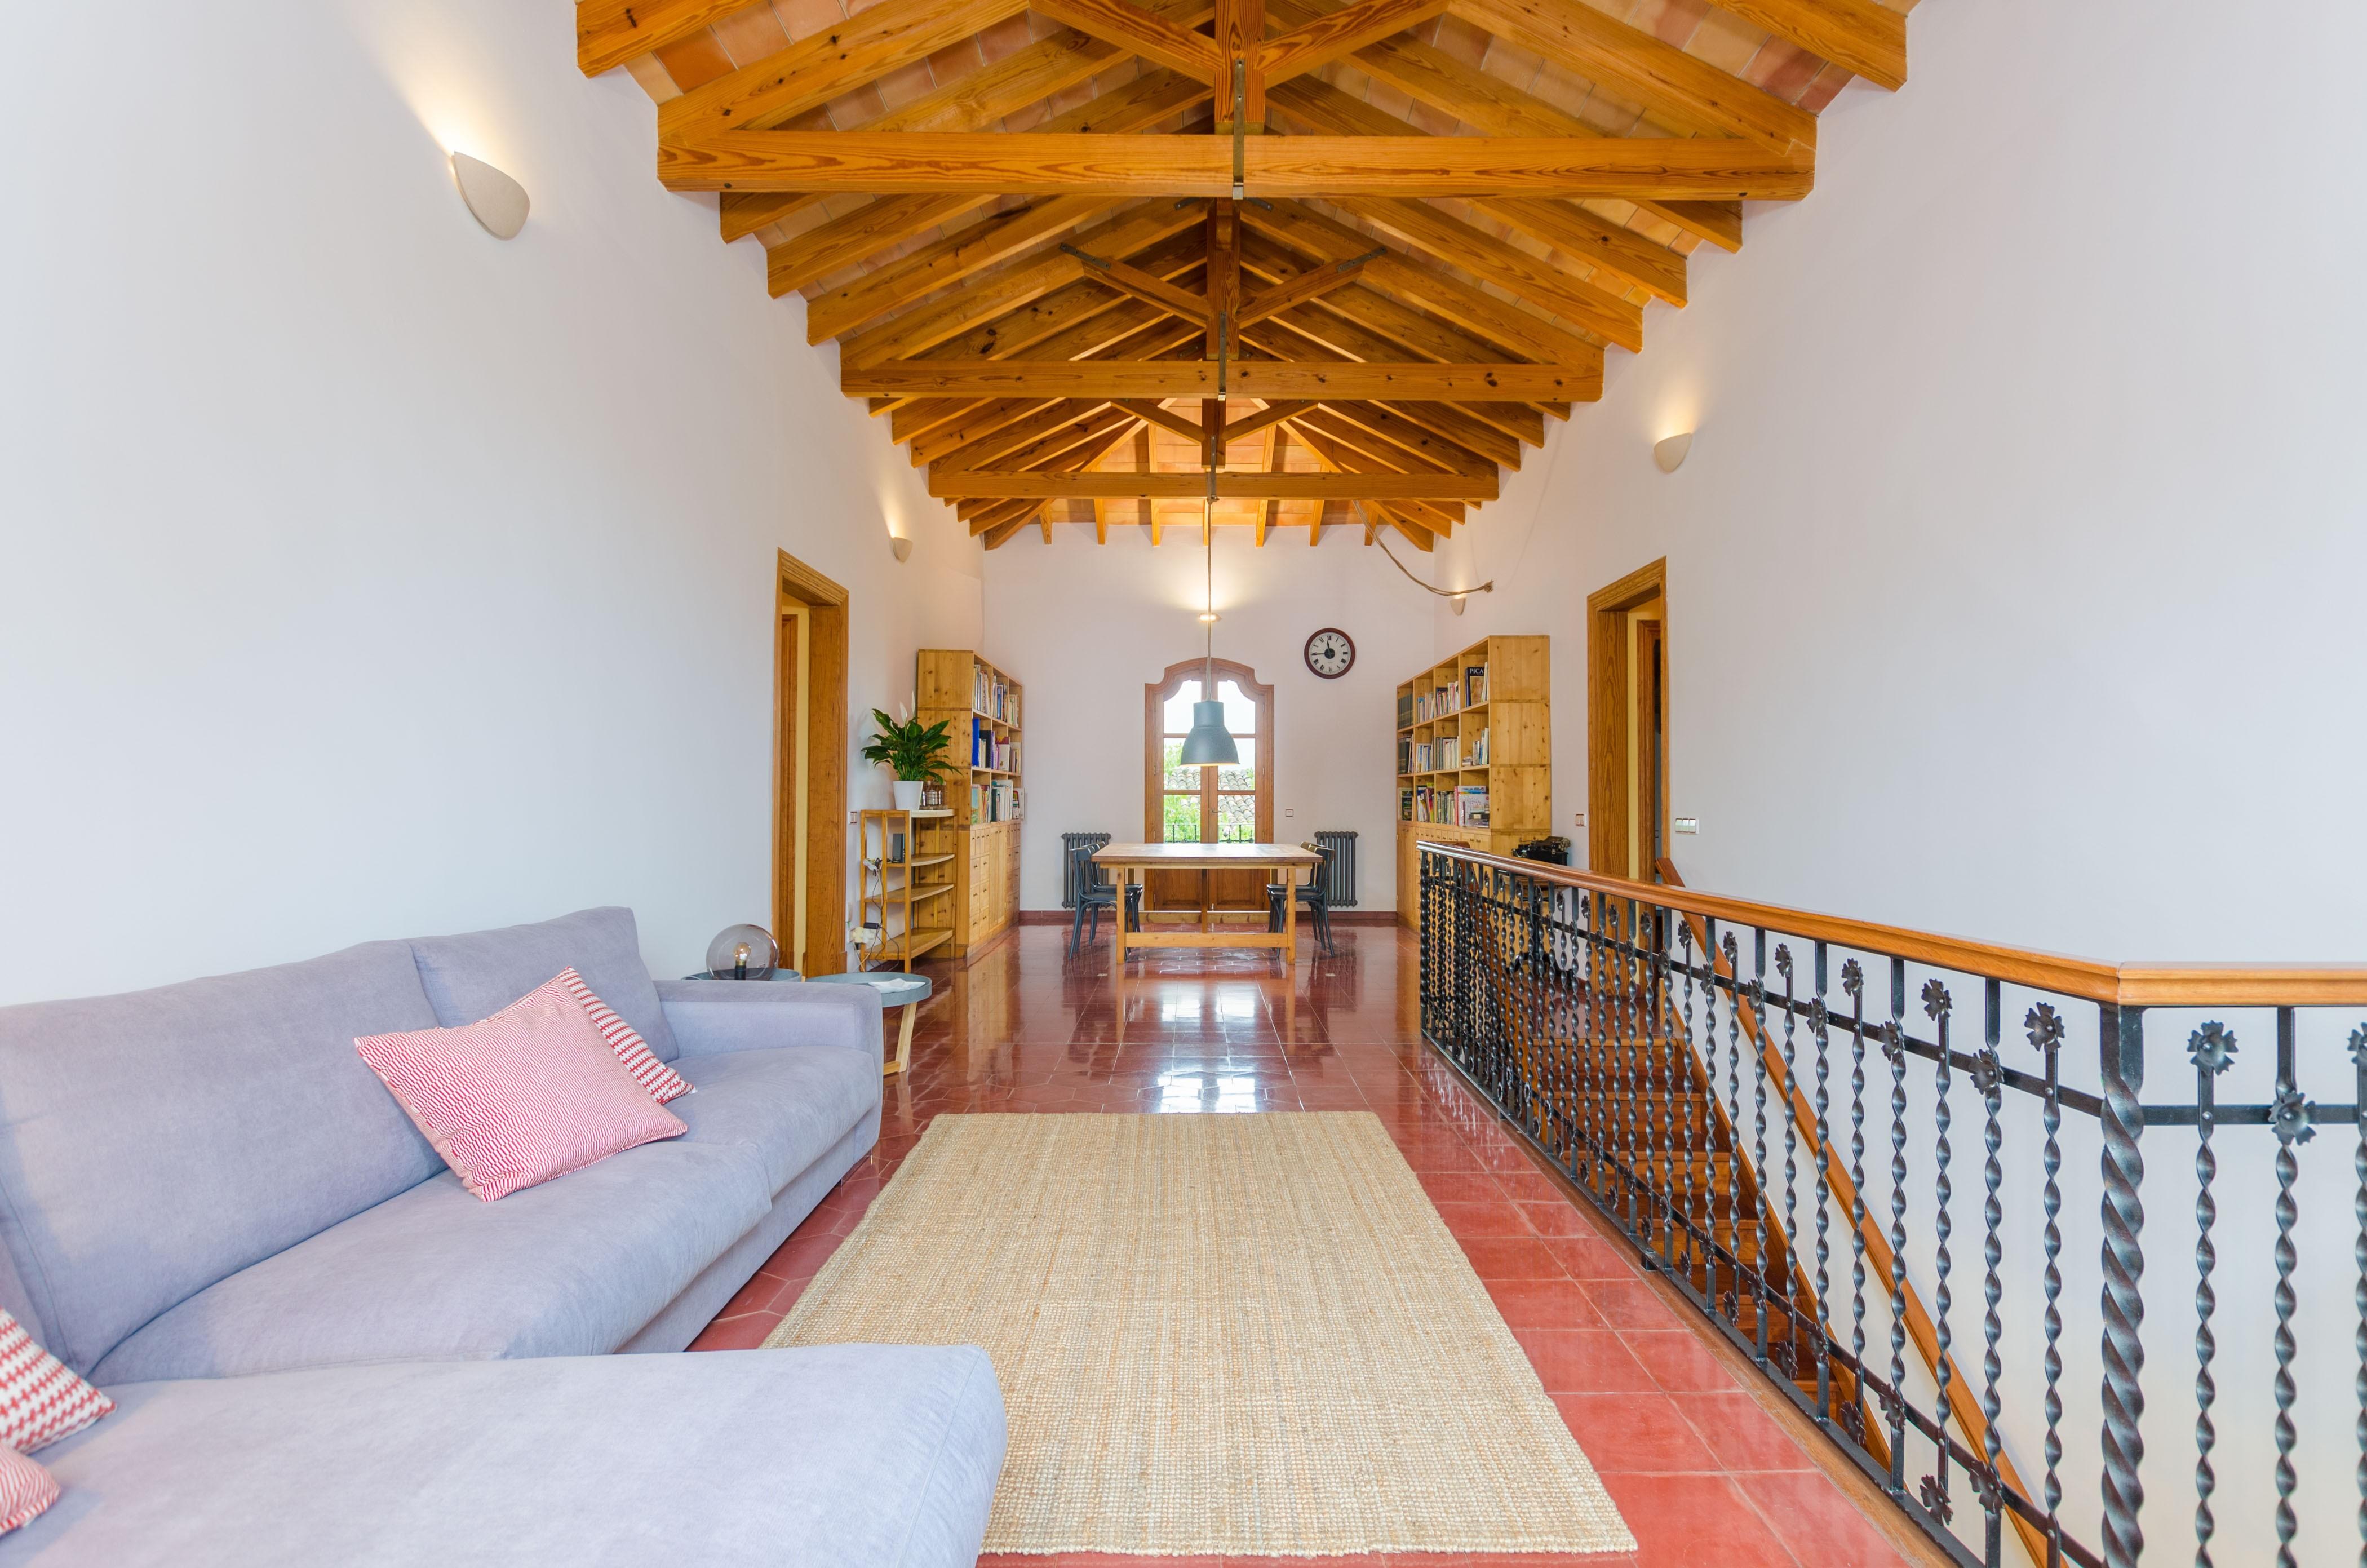 Maison de vacances CAS CONVIDATS (2435013), Alaro, Majorque, Iles Baléares, Espagne, image 41